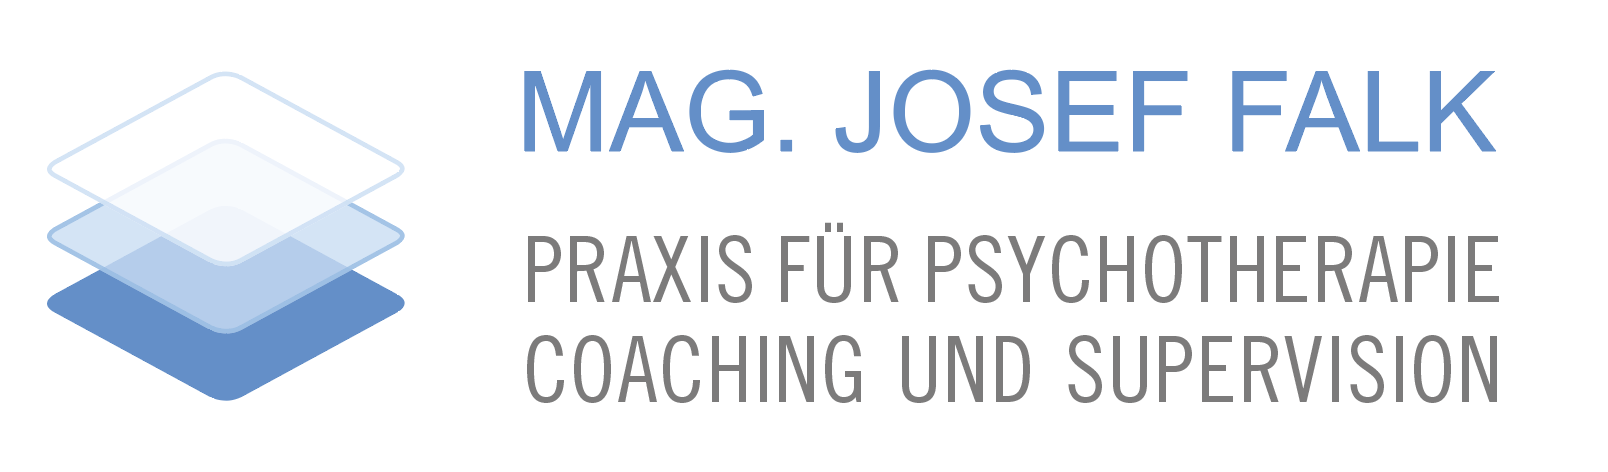 Josef Falk Psychotherapie